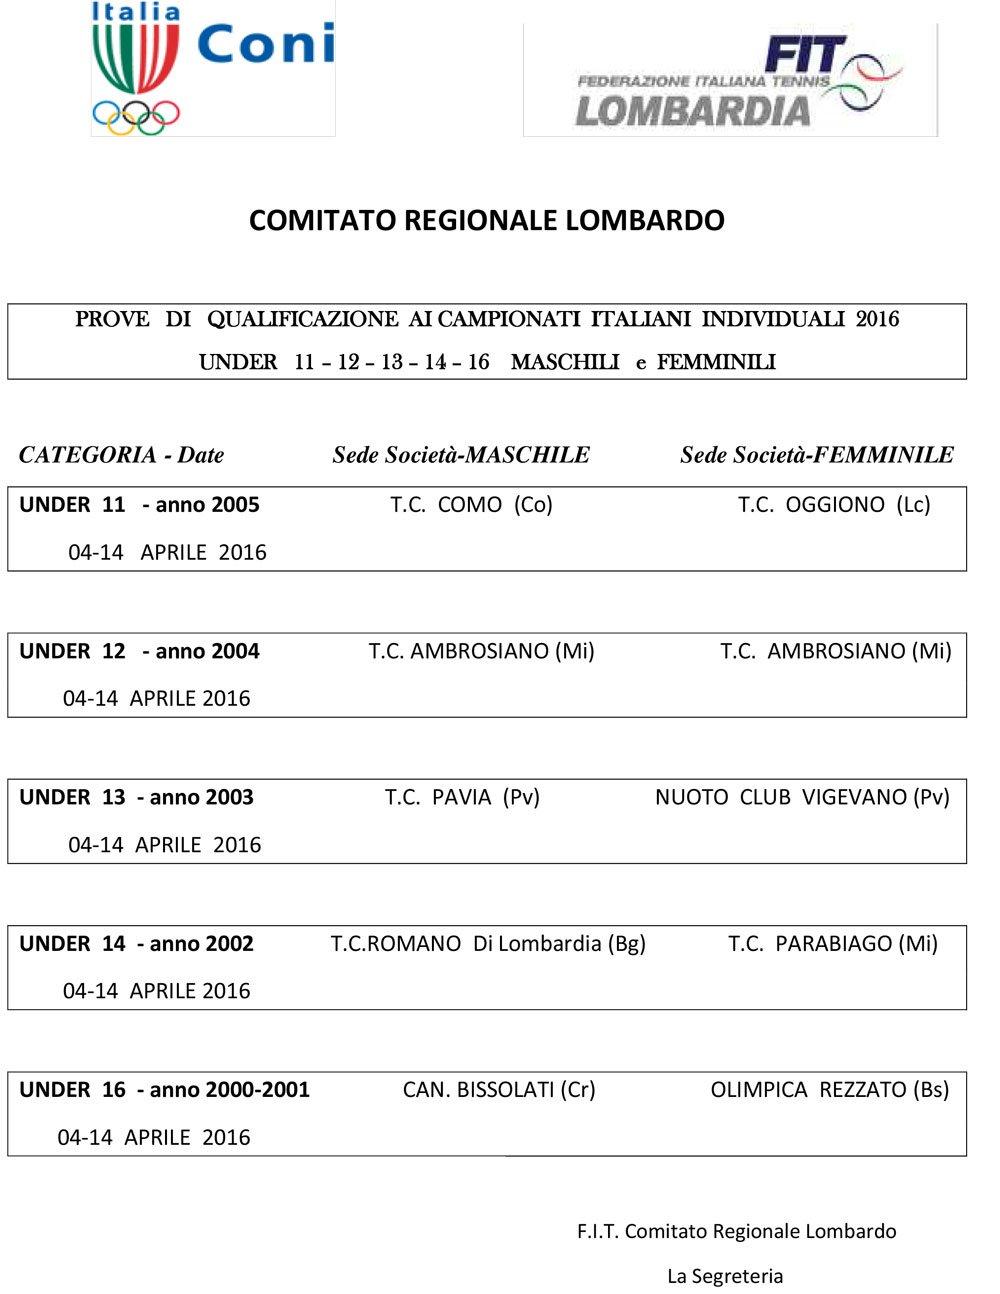 prove-qualificazioni-cmpionati-italiani-under